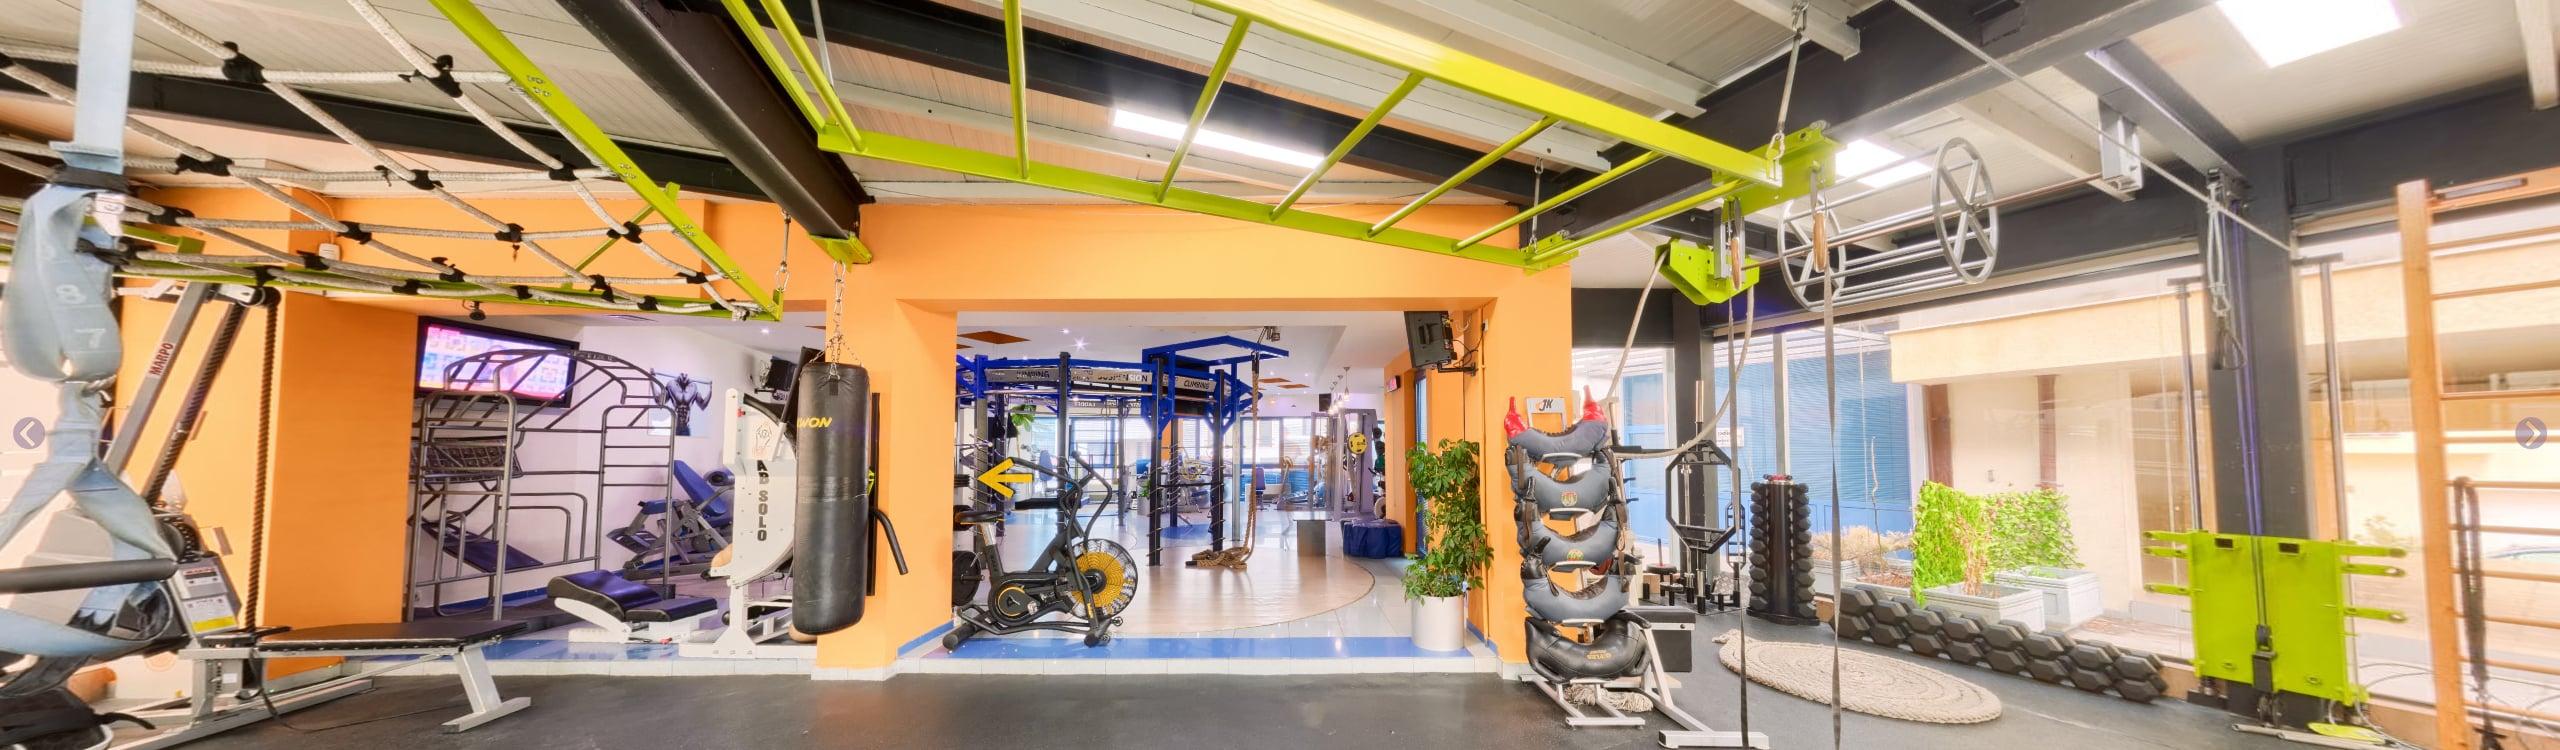 Зала за функционална кондиционна подготовка JK Fitness Gym